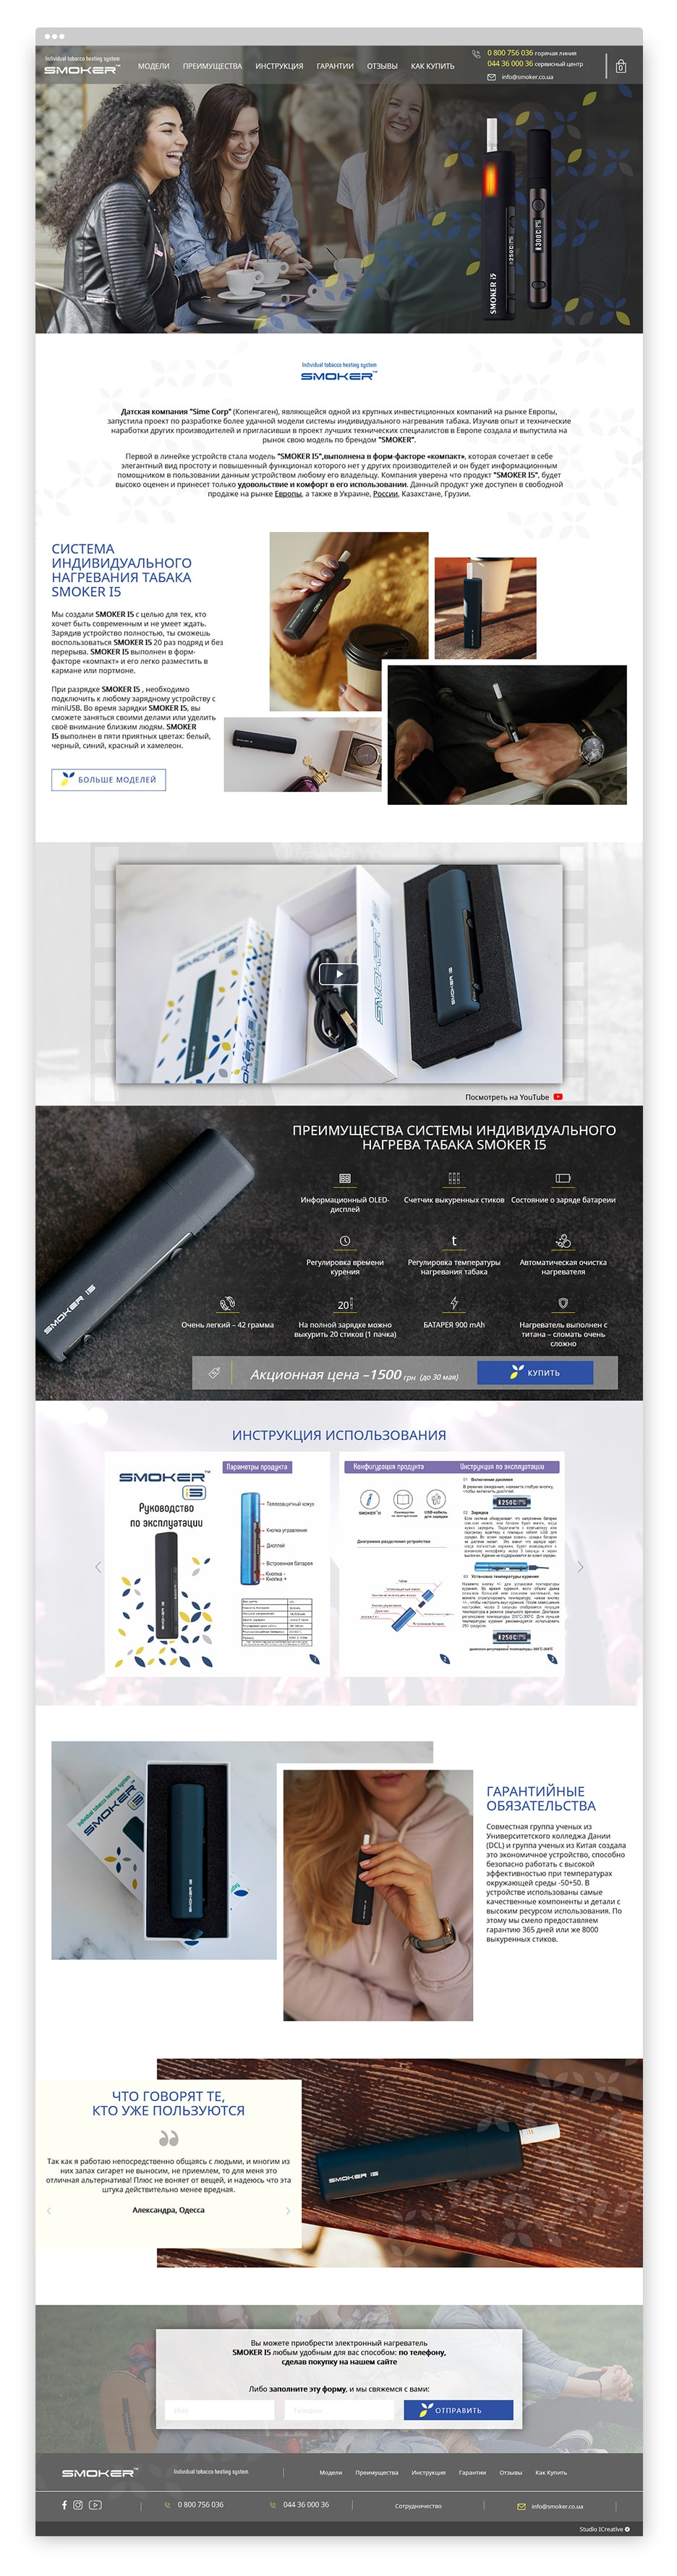 icreative.com.ua_smoker_portfolio